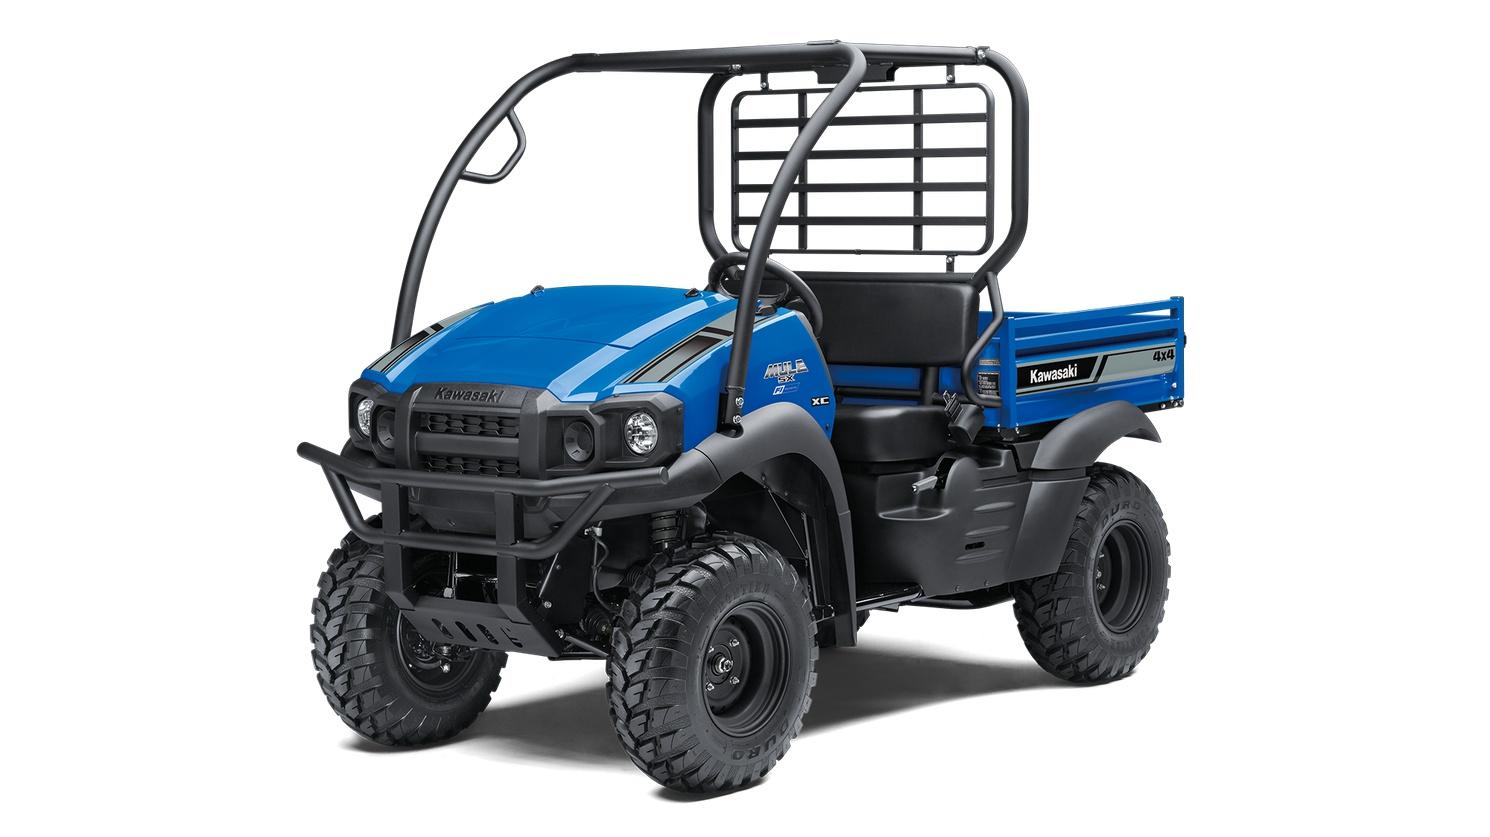 Kawasaki MULE SX 4x4 XC FI Bleu Vibrant 2021